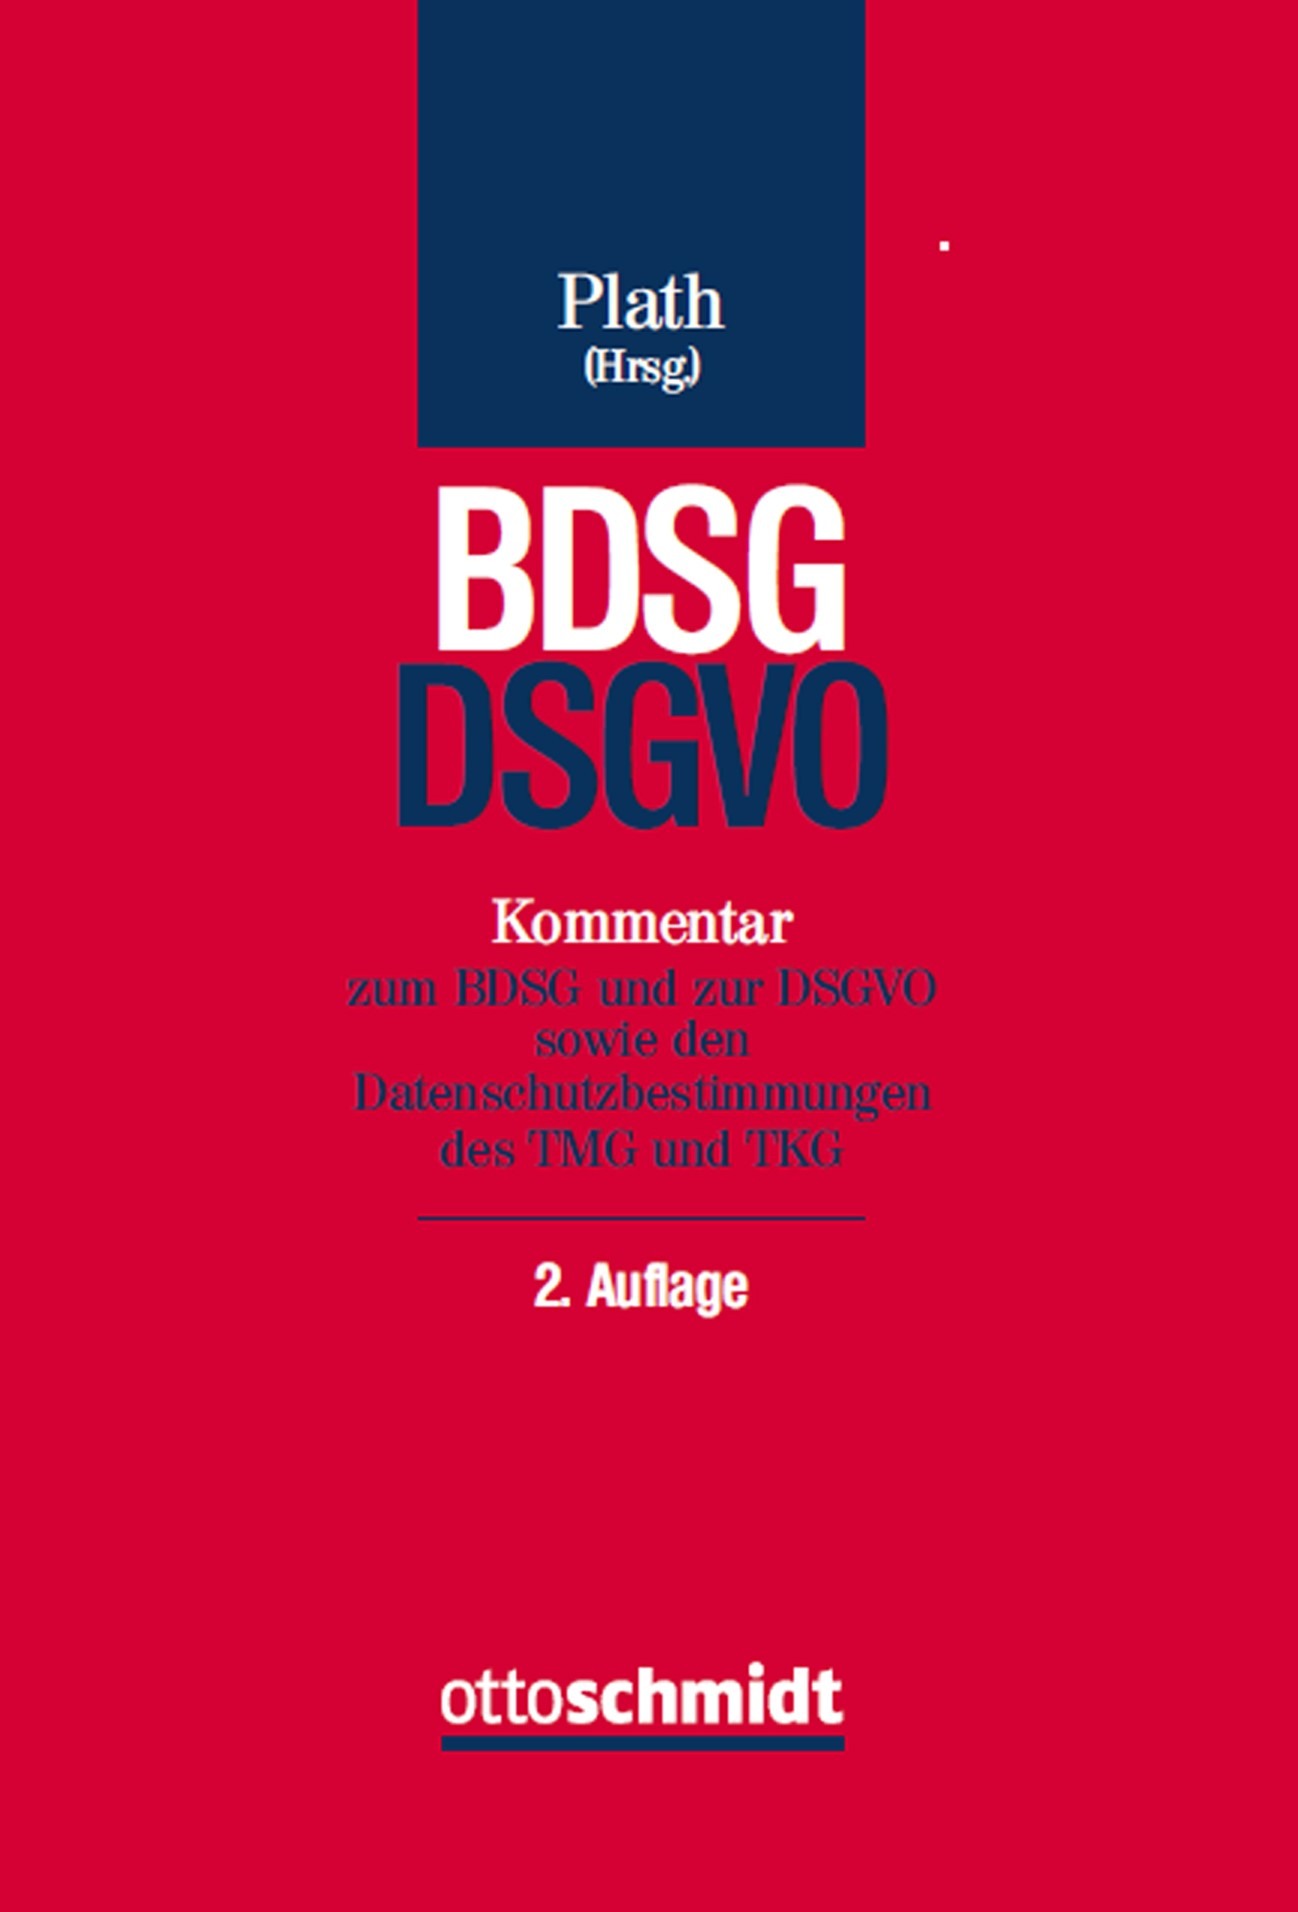 BDSG/DSGVO | Plath (Hrsg.) | Buch (Cover)